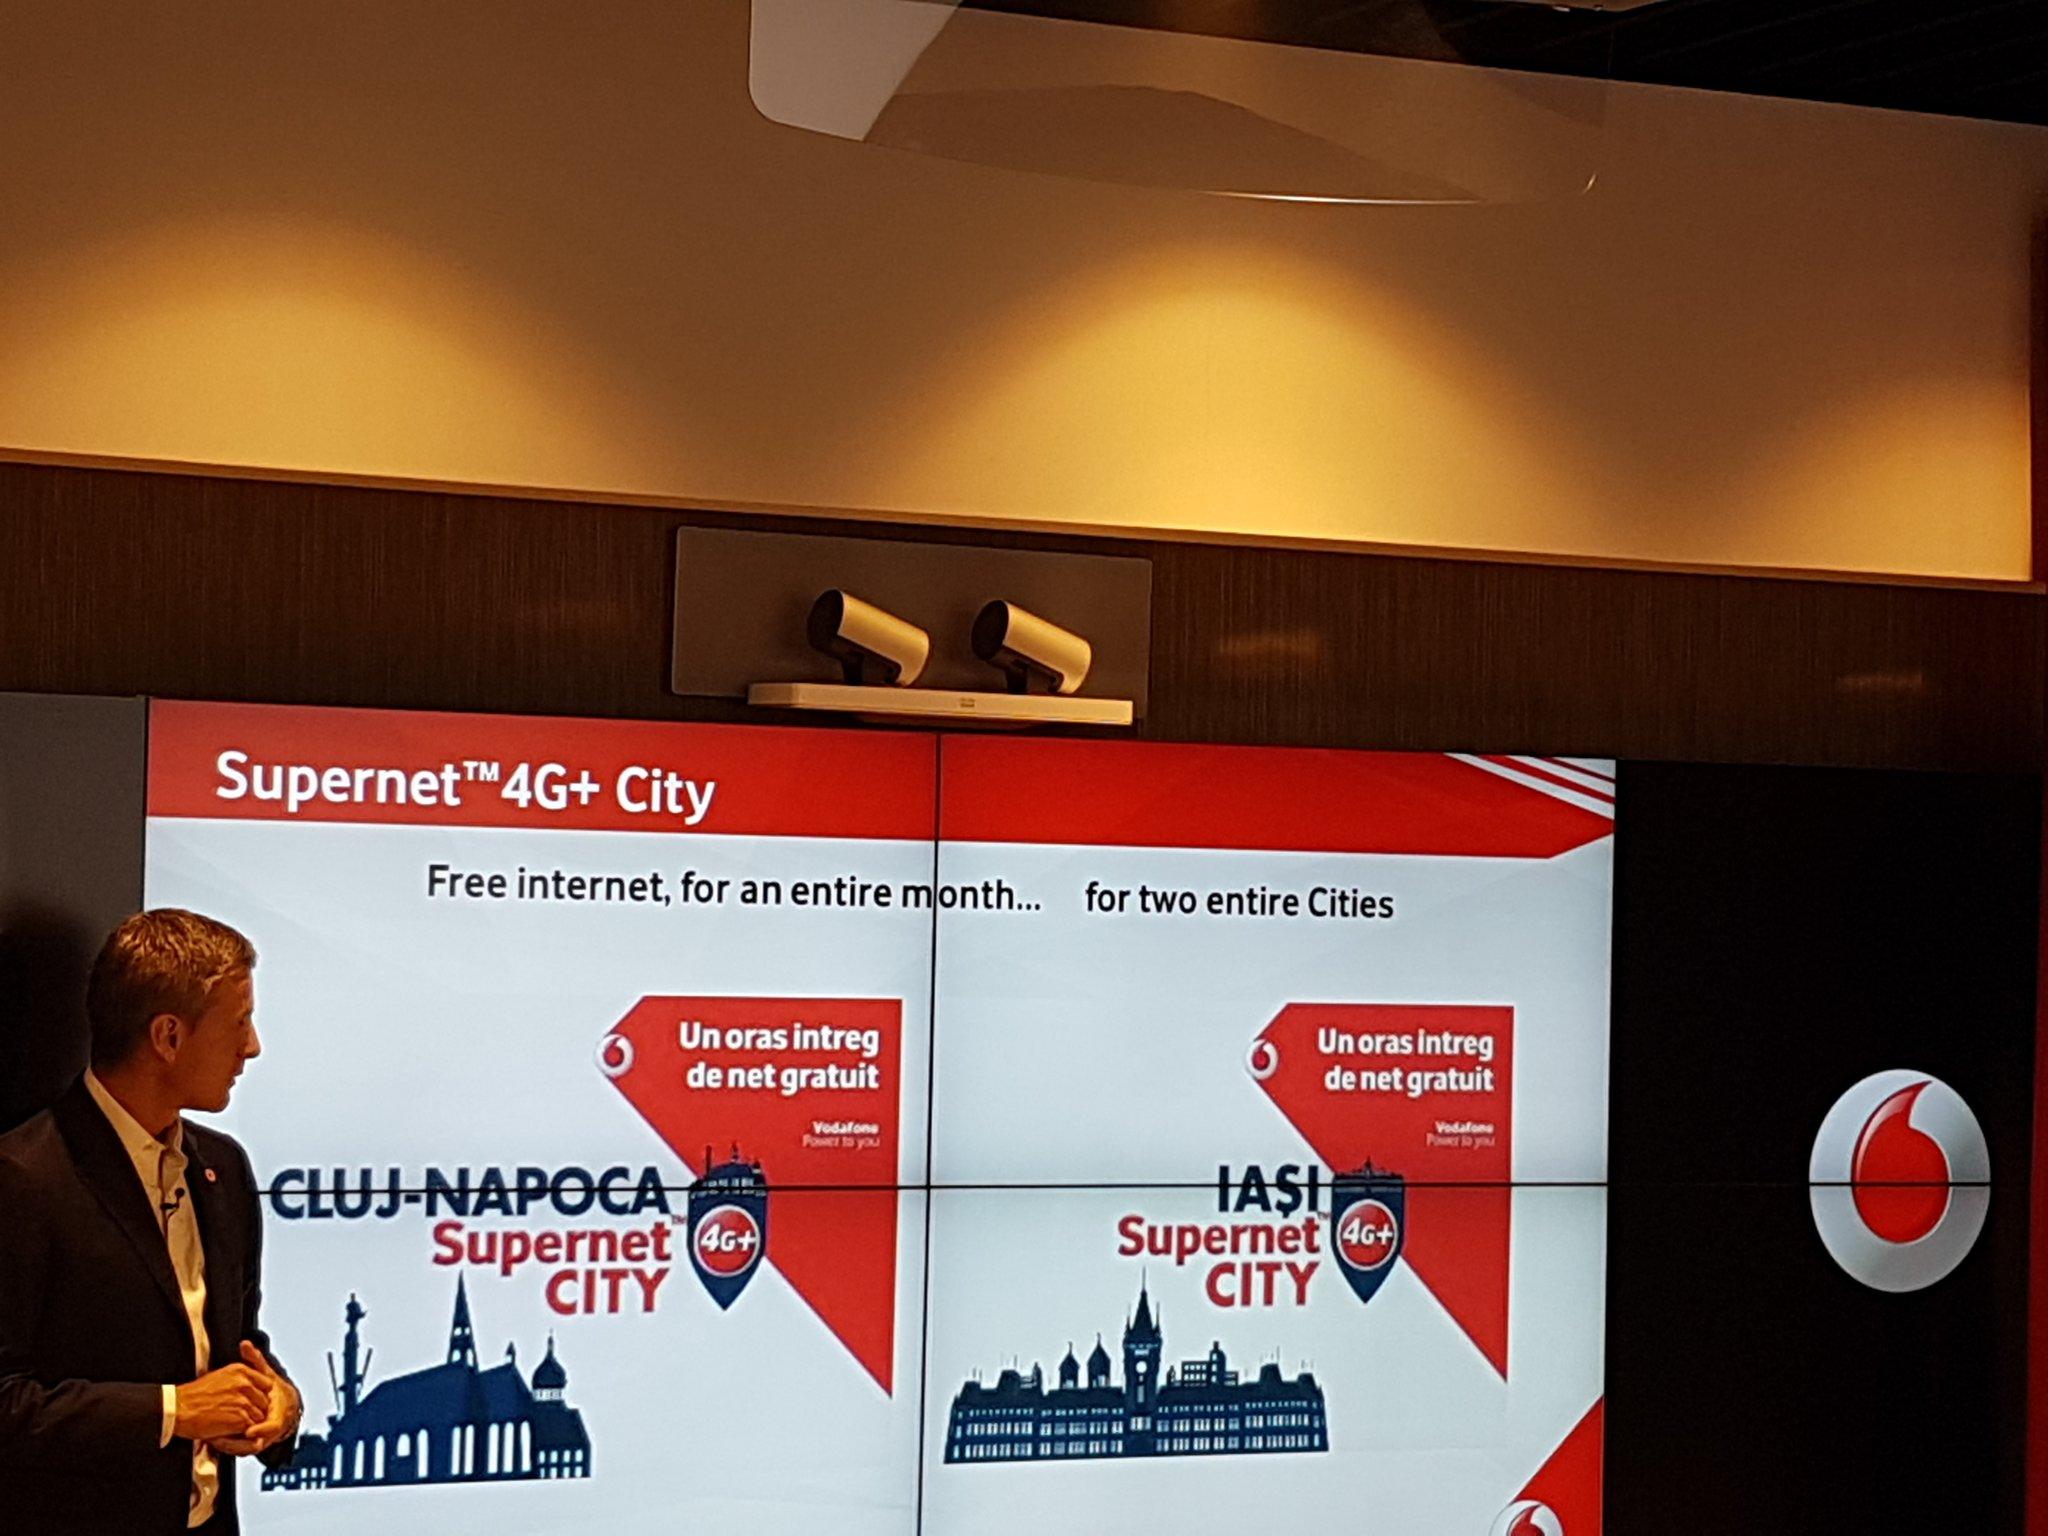 supernet 4g+ city vodafone